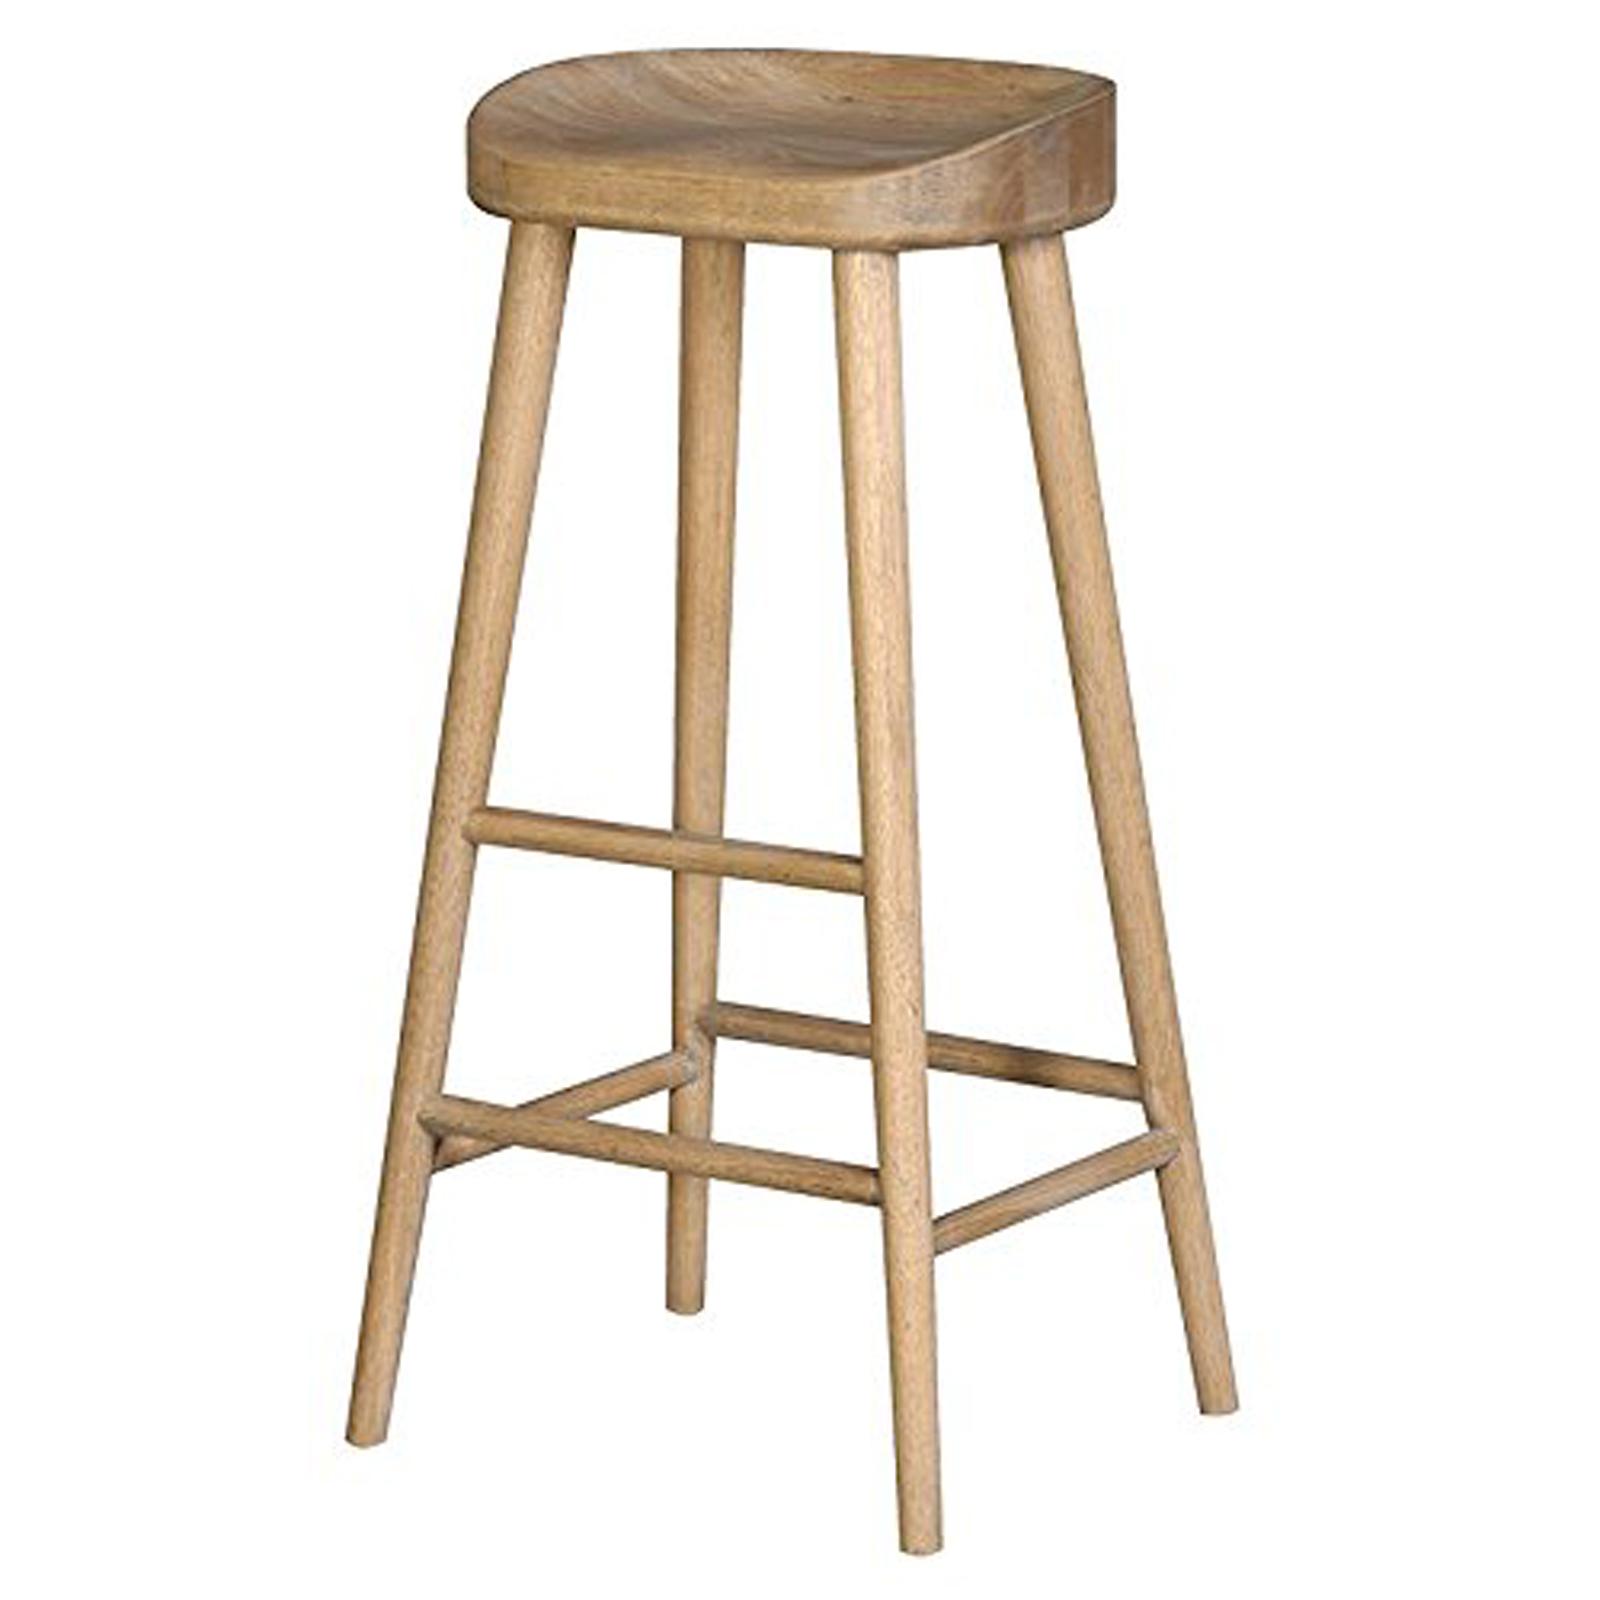 Miraculous Weathered Oak Breakfast Bar Stool Ibusinesslaw Wood Chair Design Ideas Ibusinesslaworg